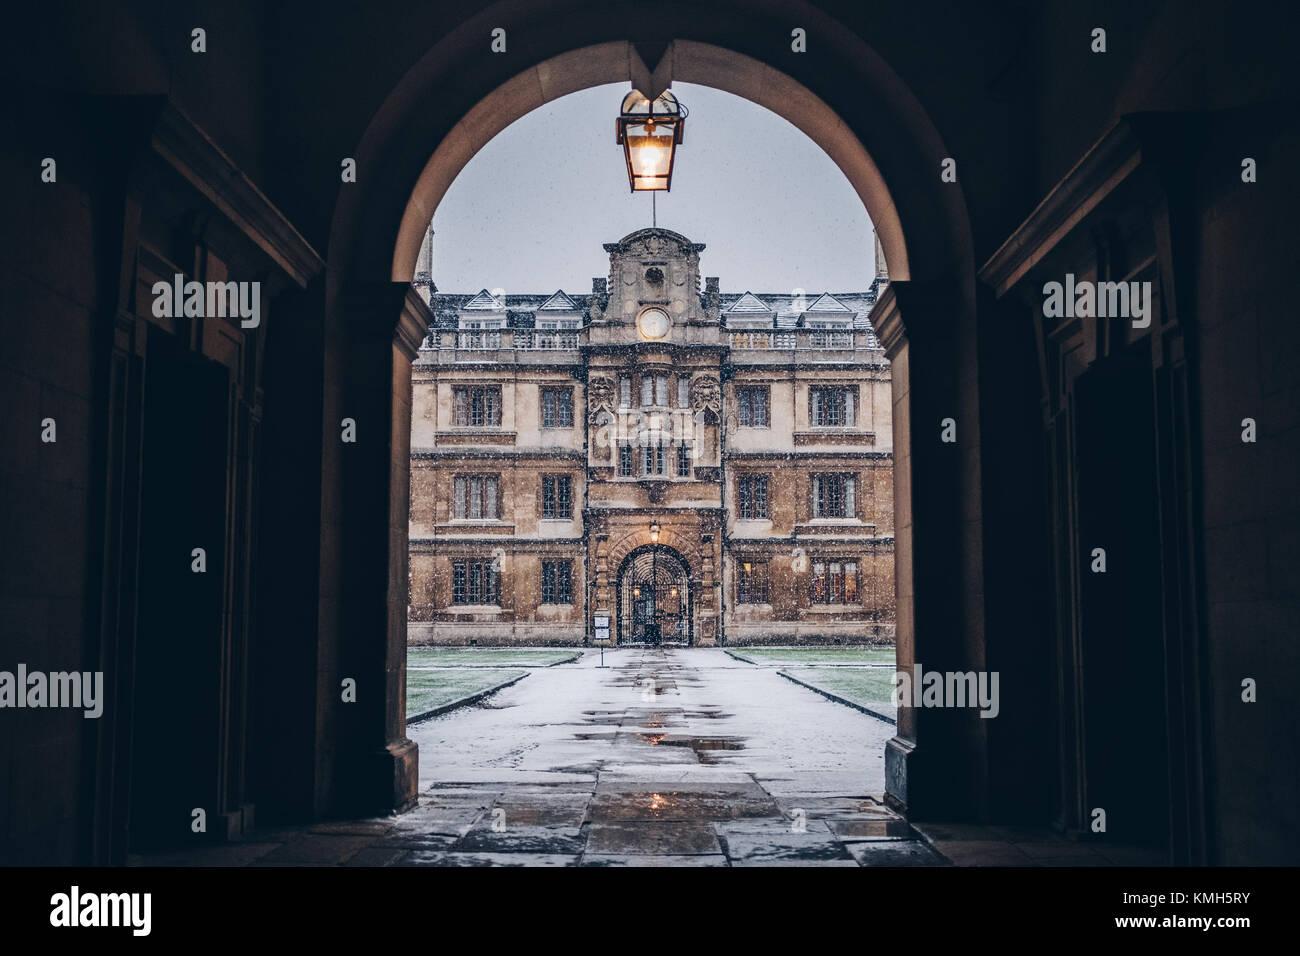 Cambridge, Cambridgeshire, UK. 10th Dec, 2017. Weather: Heavy snow in morning at Clare College MCR in Cambridge. - Stock Image